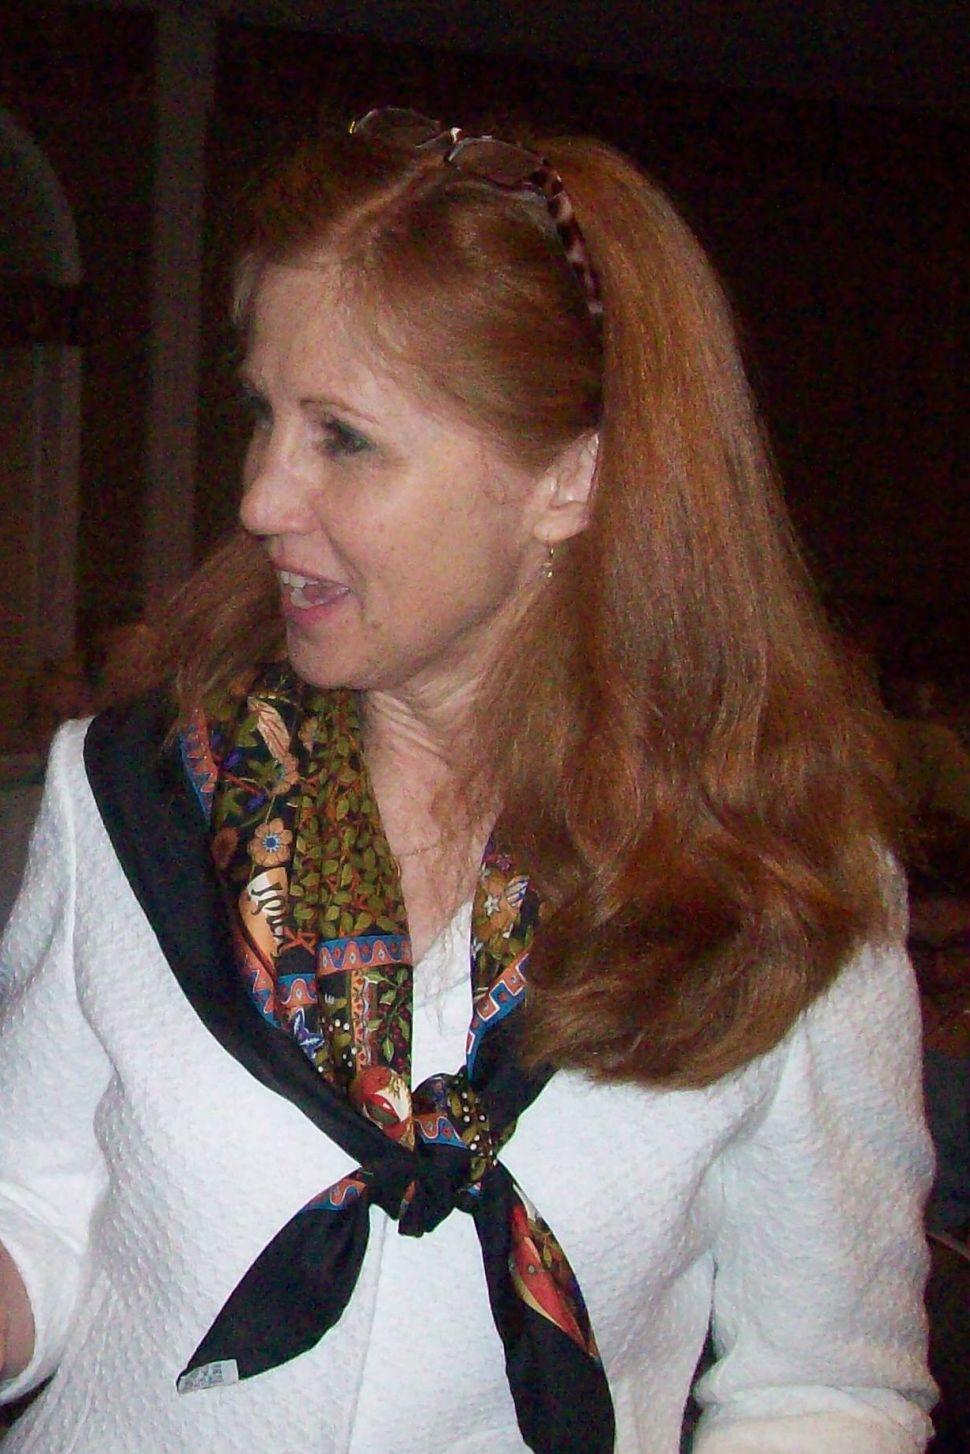 Nancy Munoz sworn into office